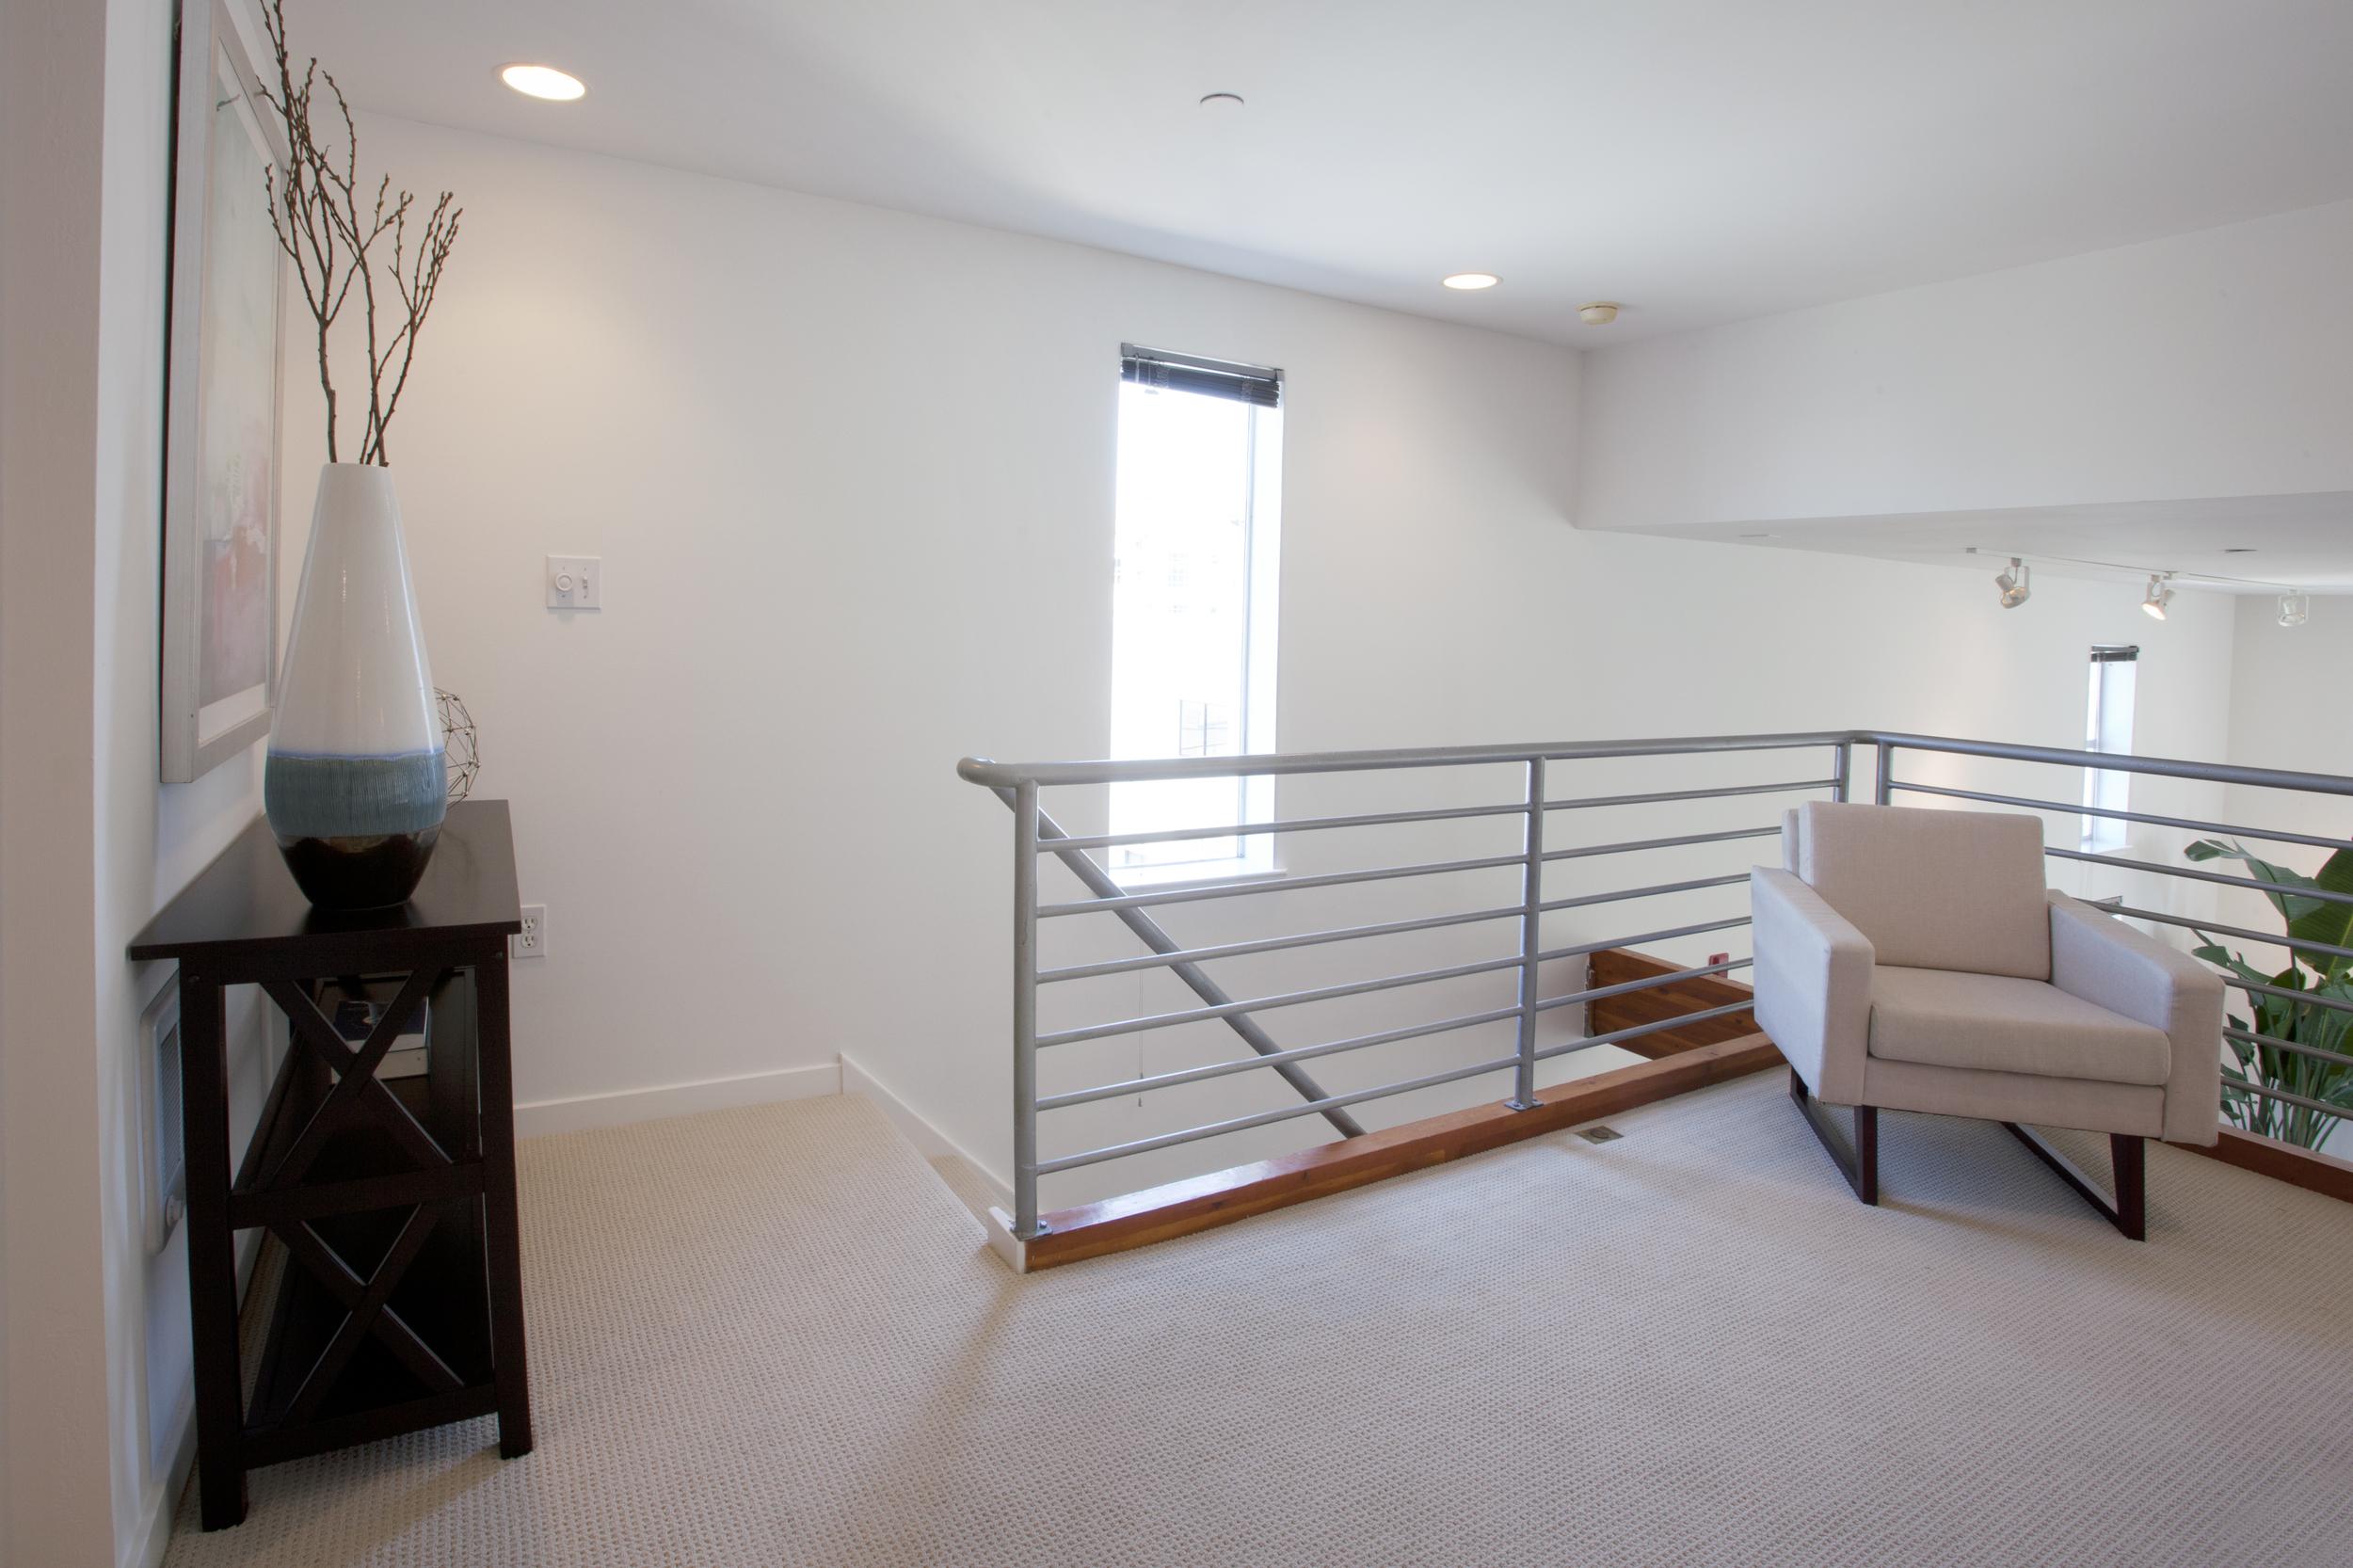 Upstairs5.jpg